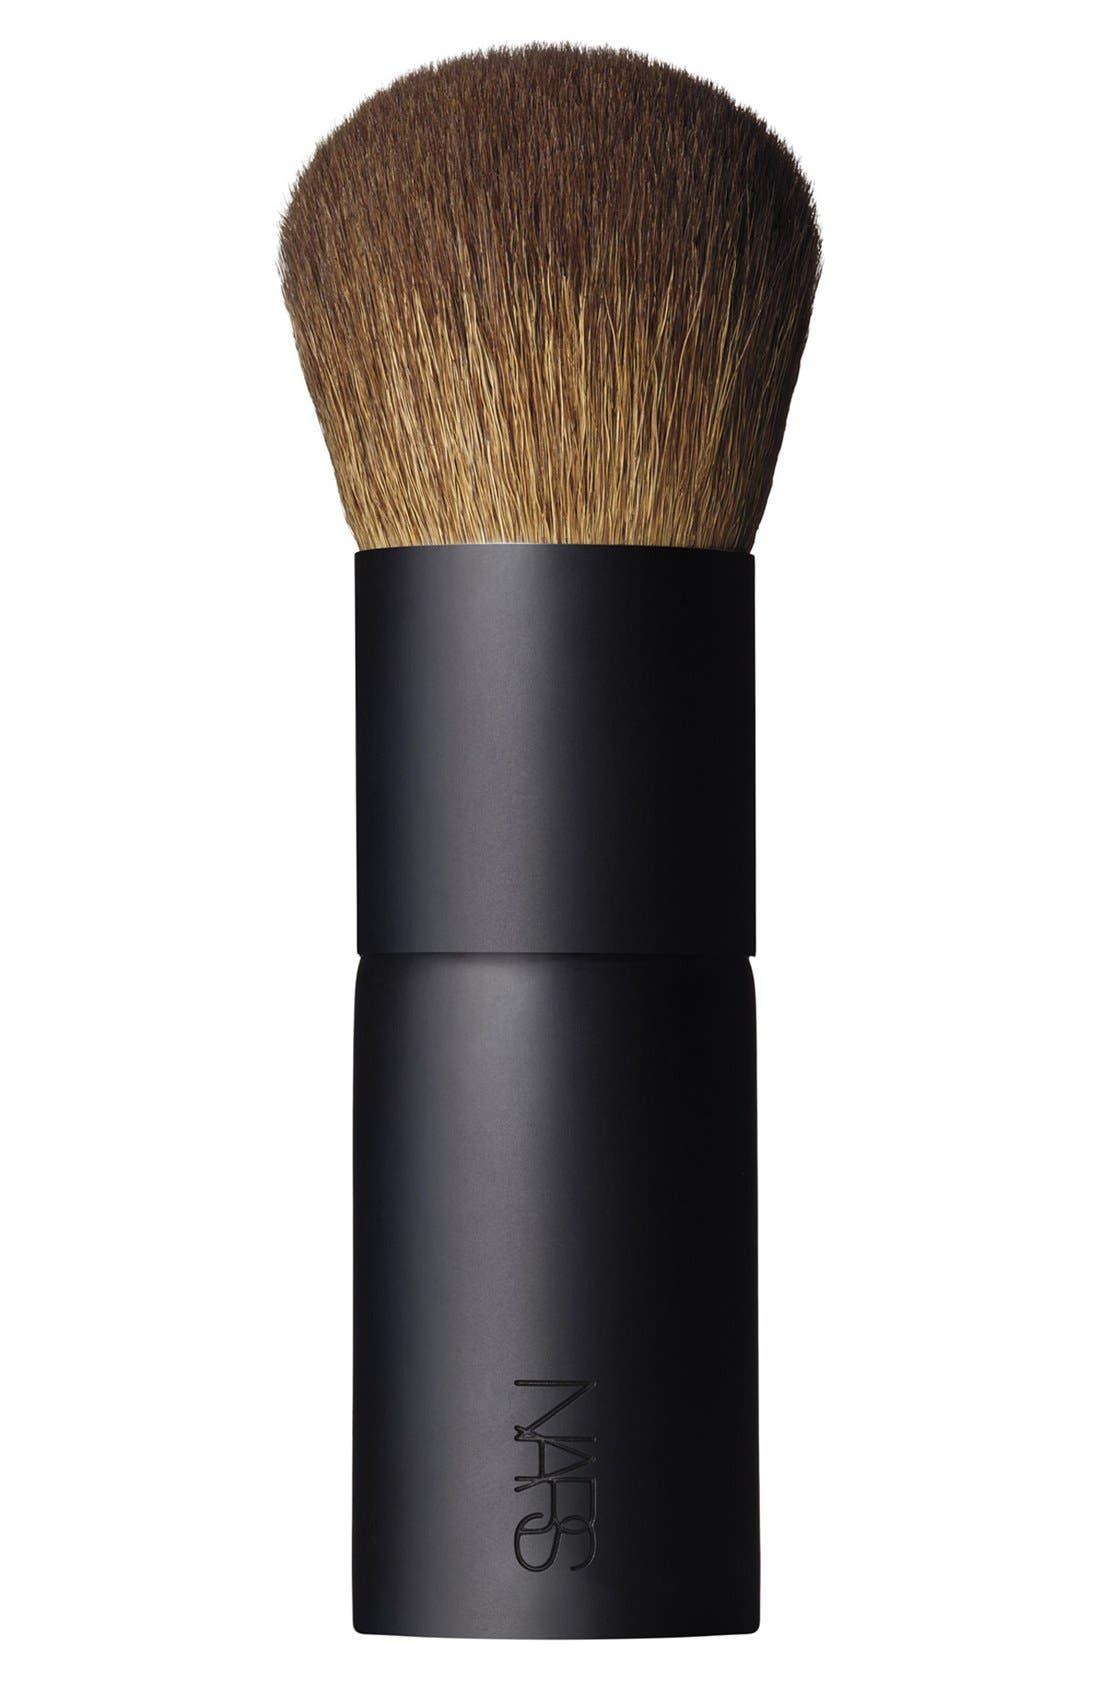 #11 Bronzing Powder Brush,                         Main,                         color, 000